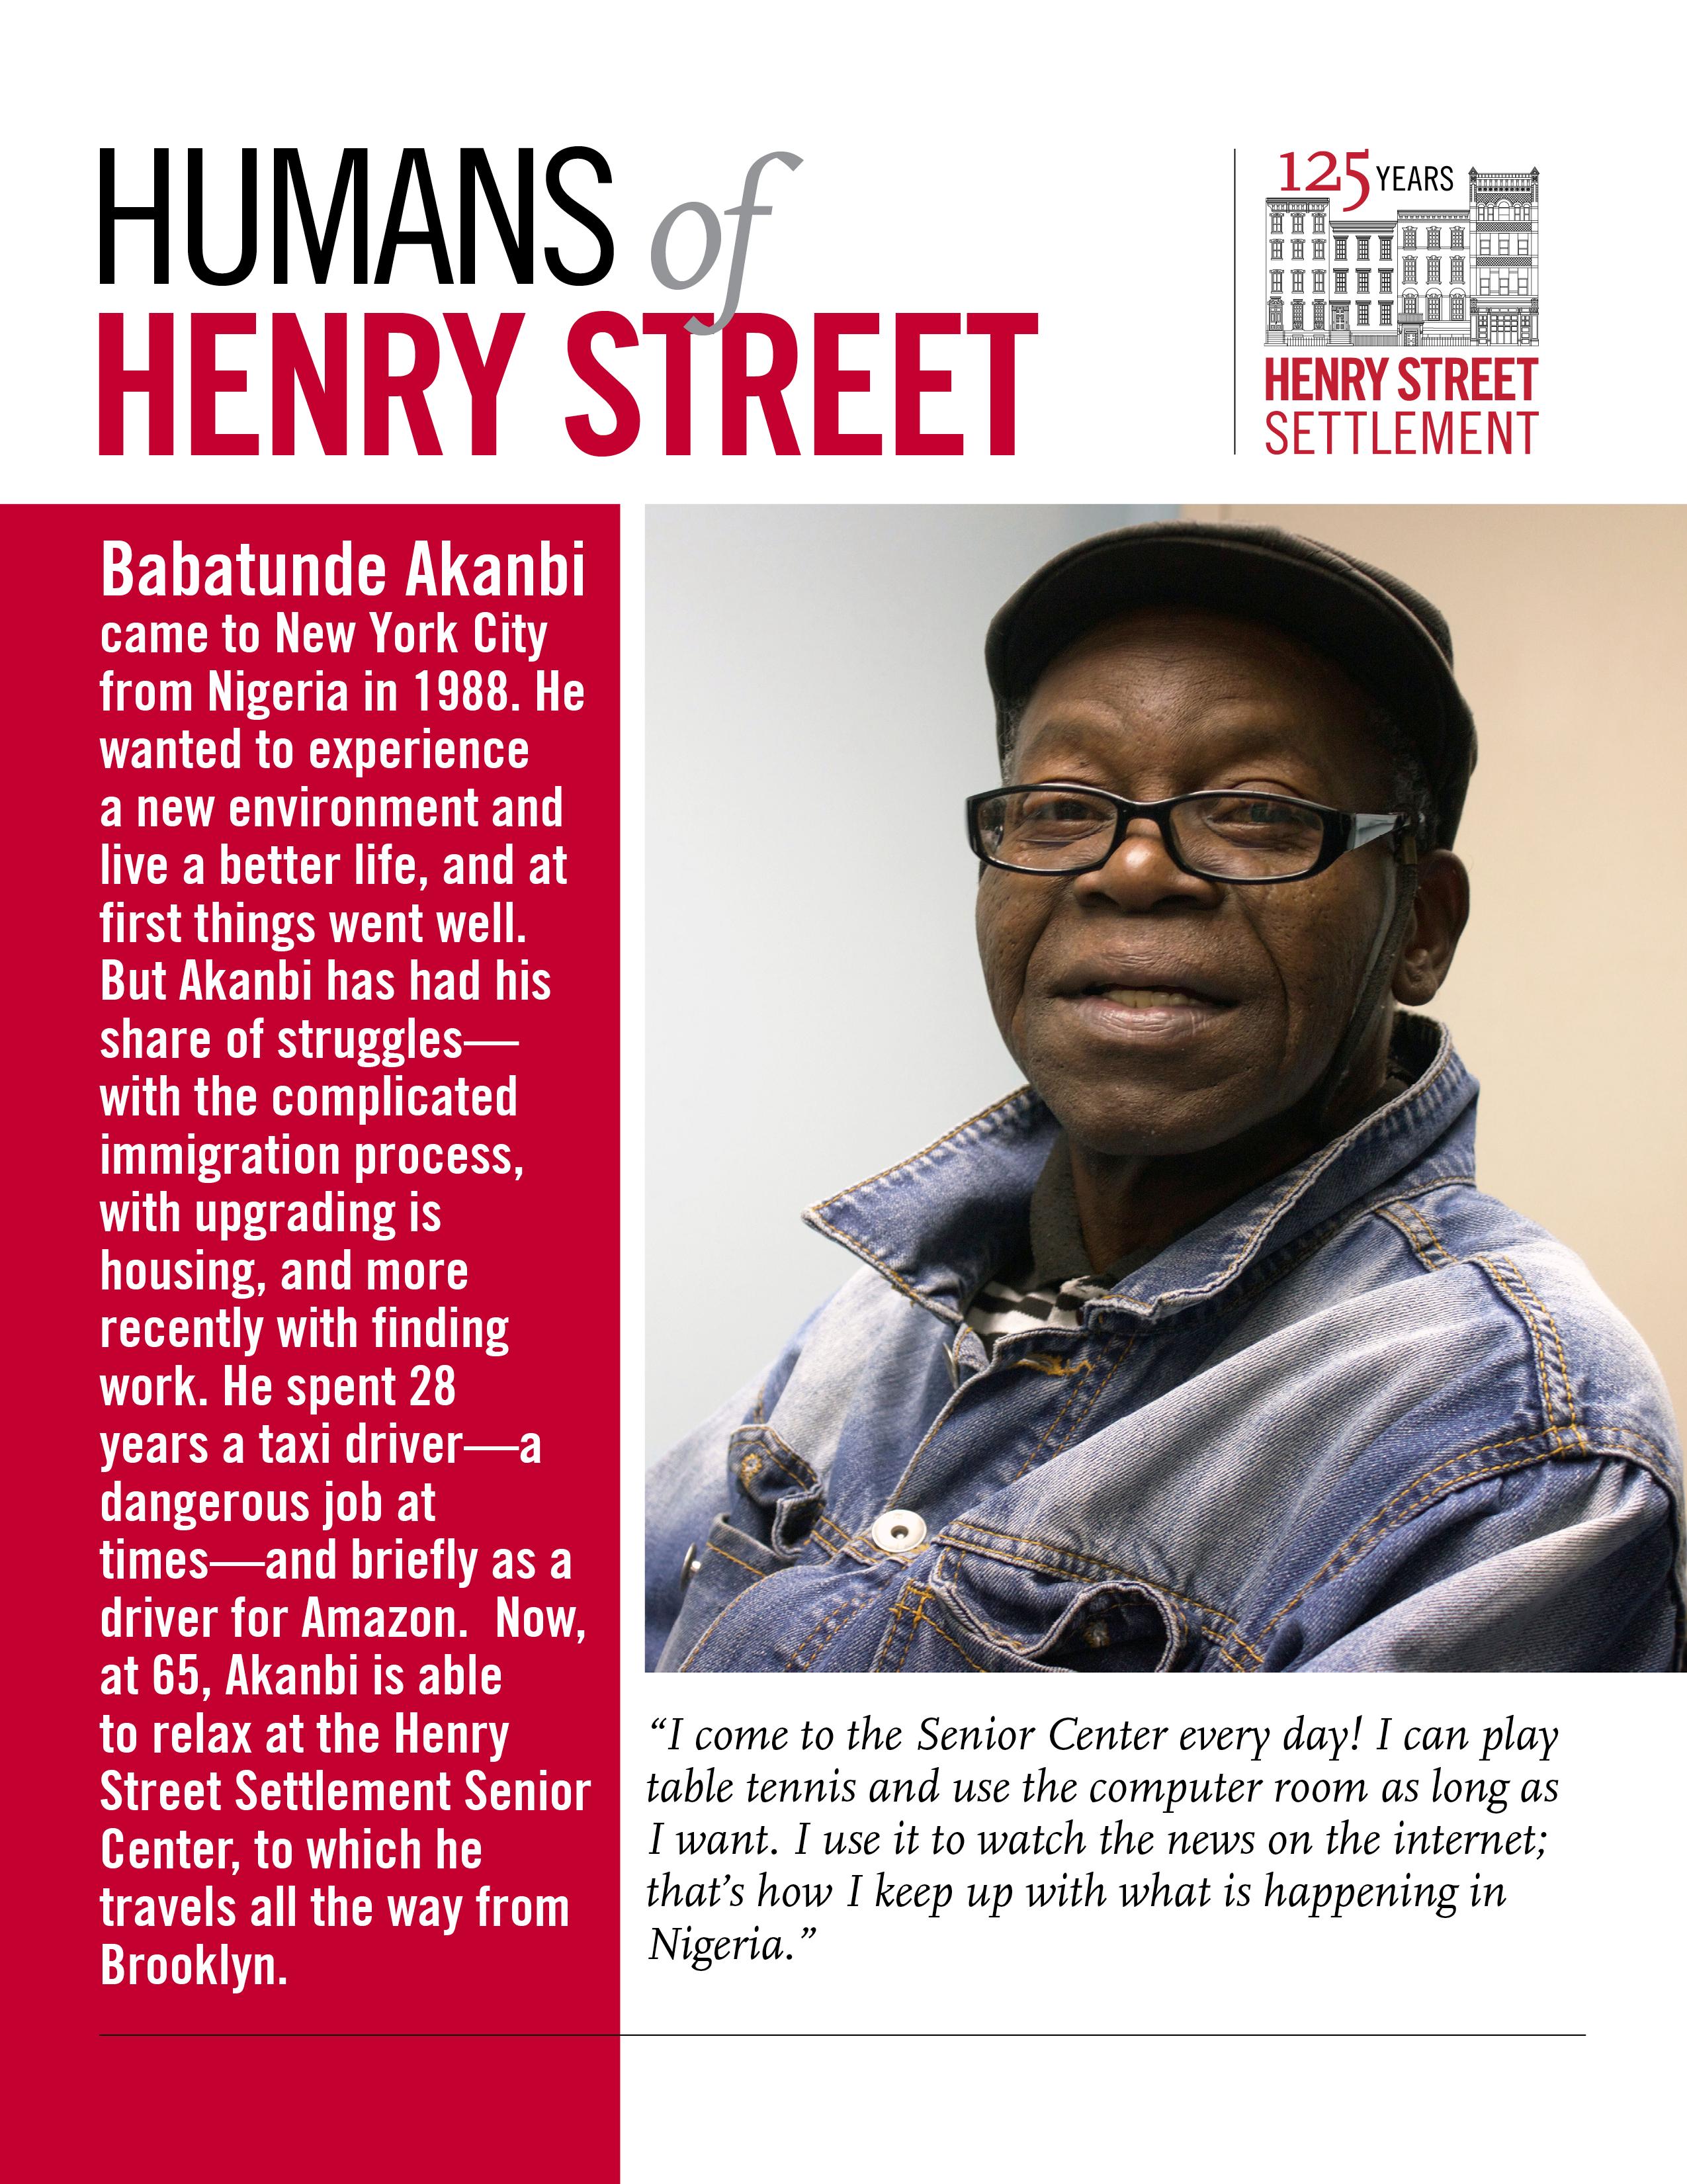 968a4e3631 Humans of Henry Street - Henry Street Settlement